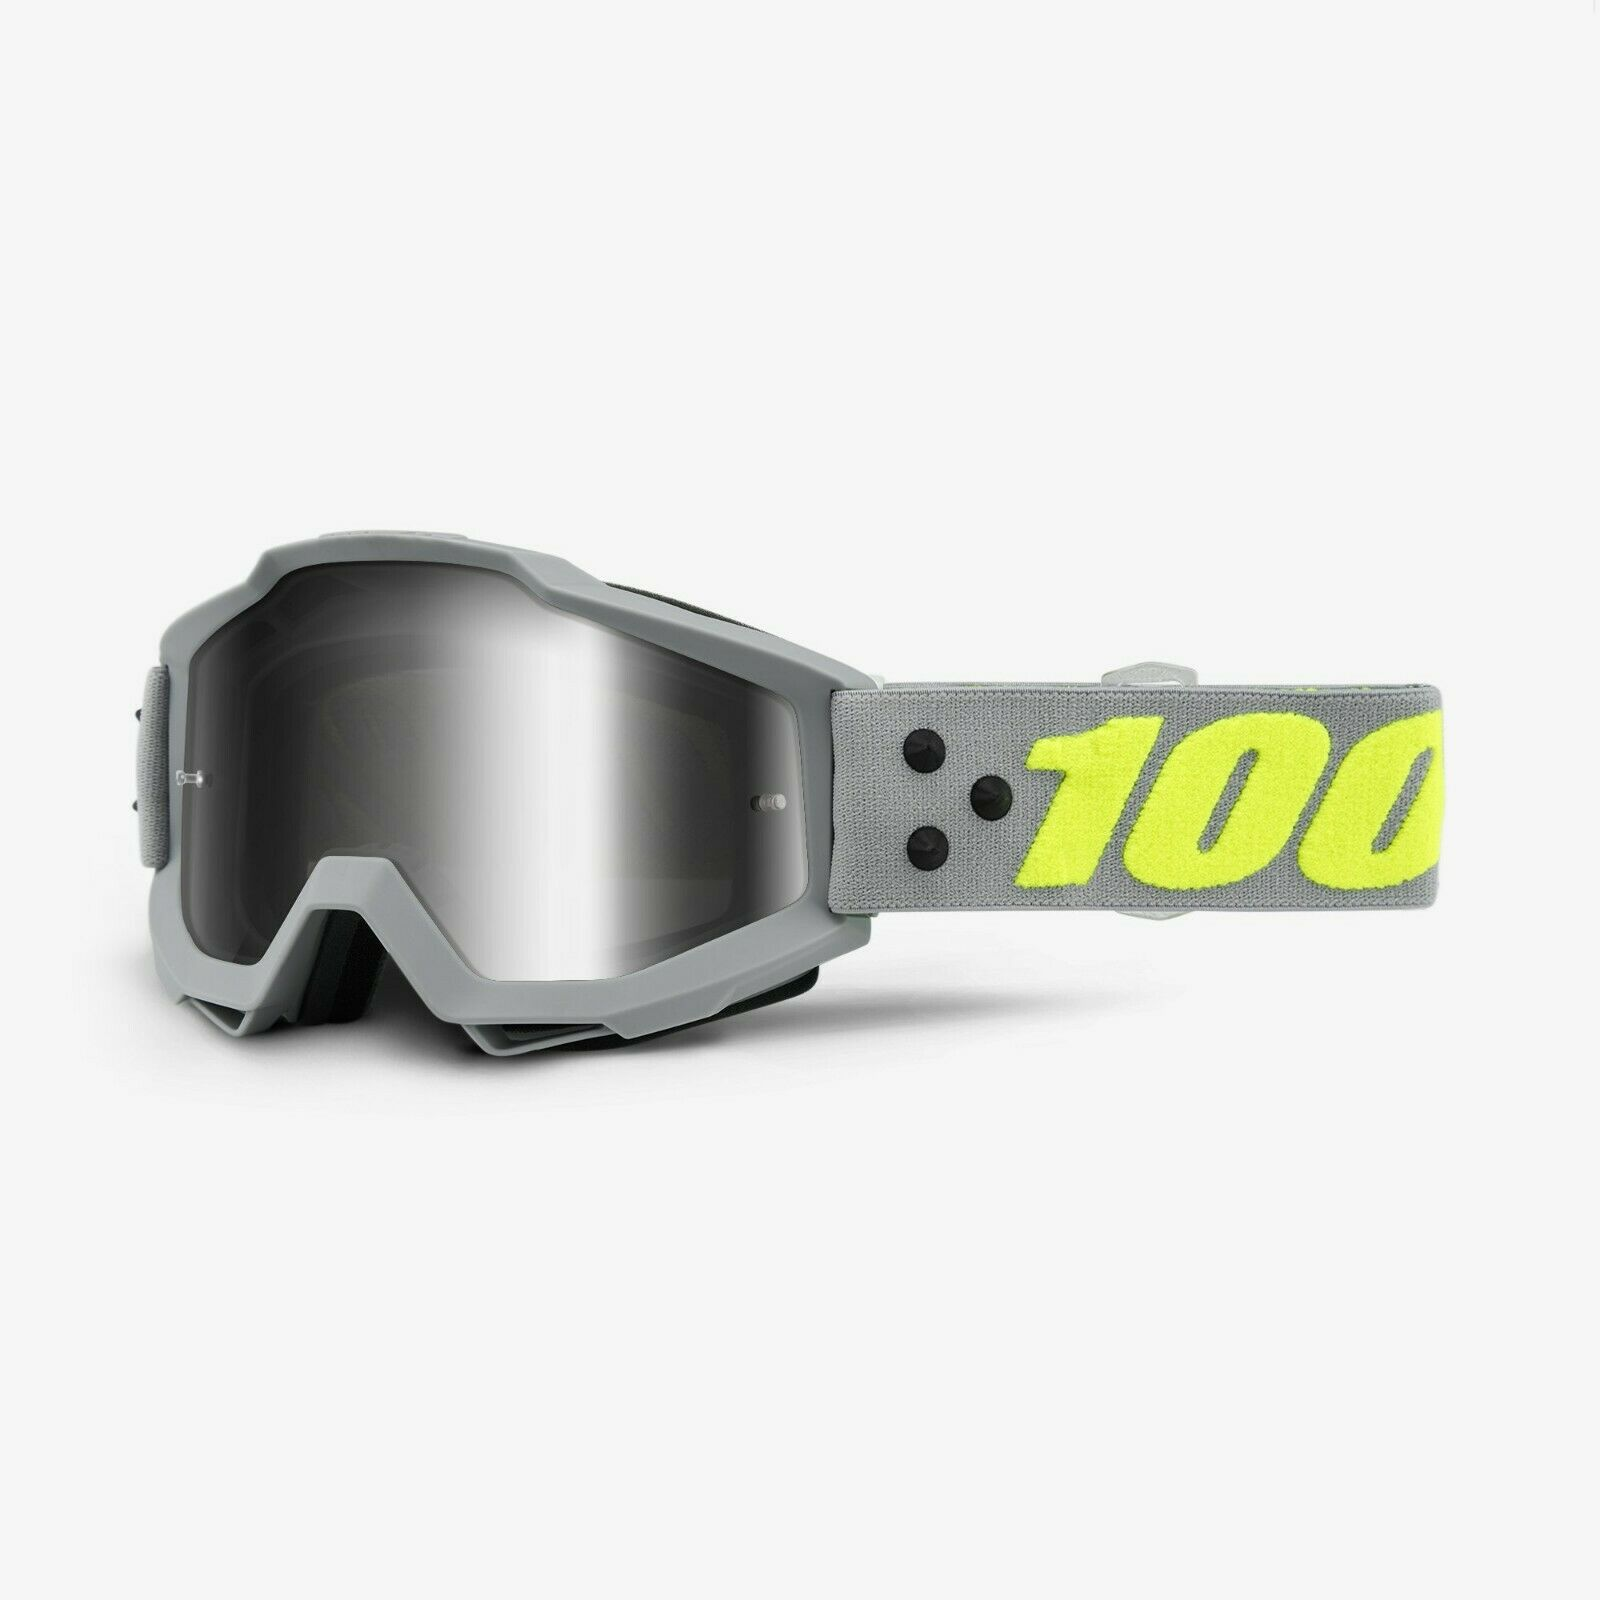 100 % Prozent Accuri Berlin grey verspiegelt MX Motocross Cross Brille MTB BMX